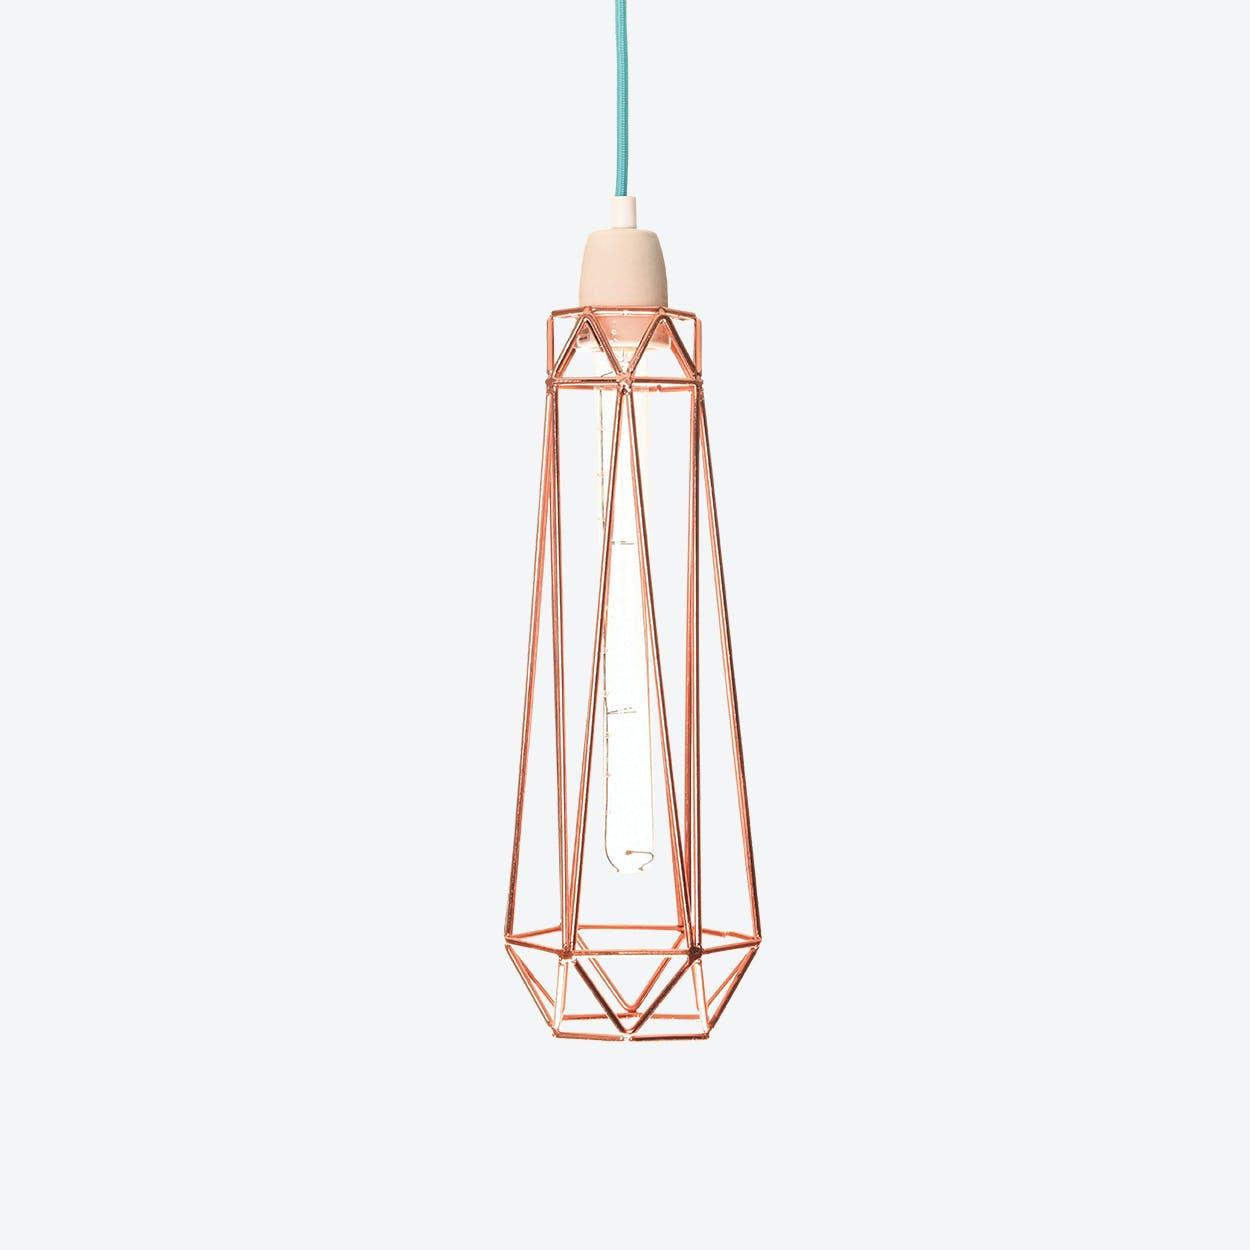 Industrial Pendant Light Slim Diamond in Copper with Blue Cord